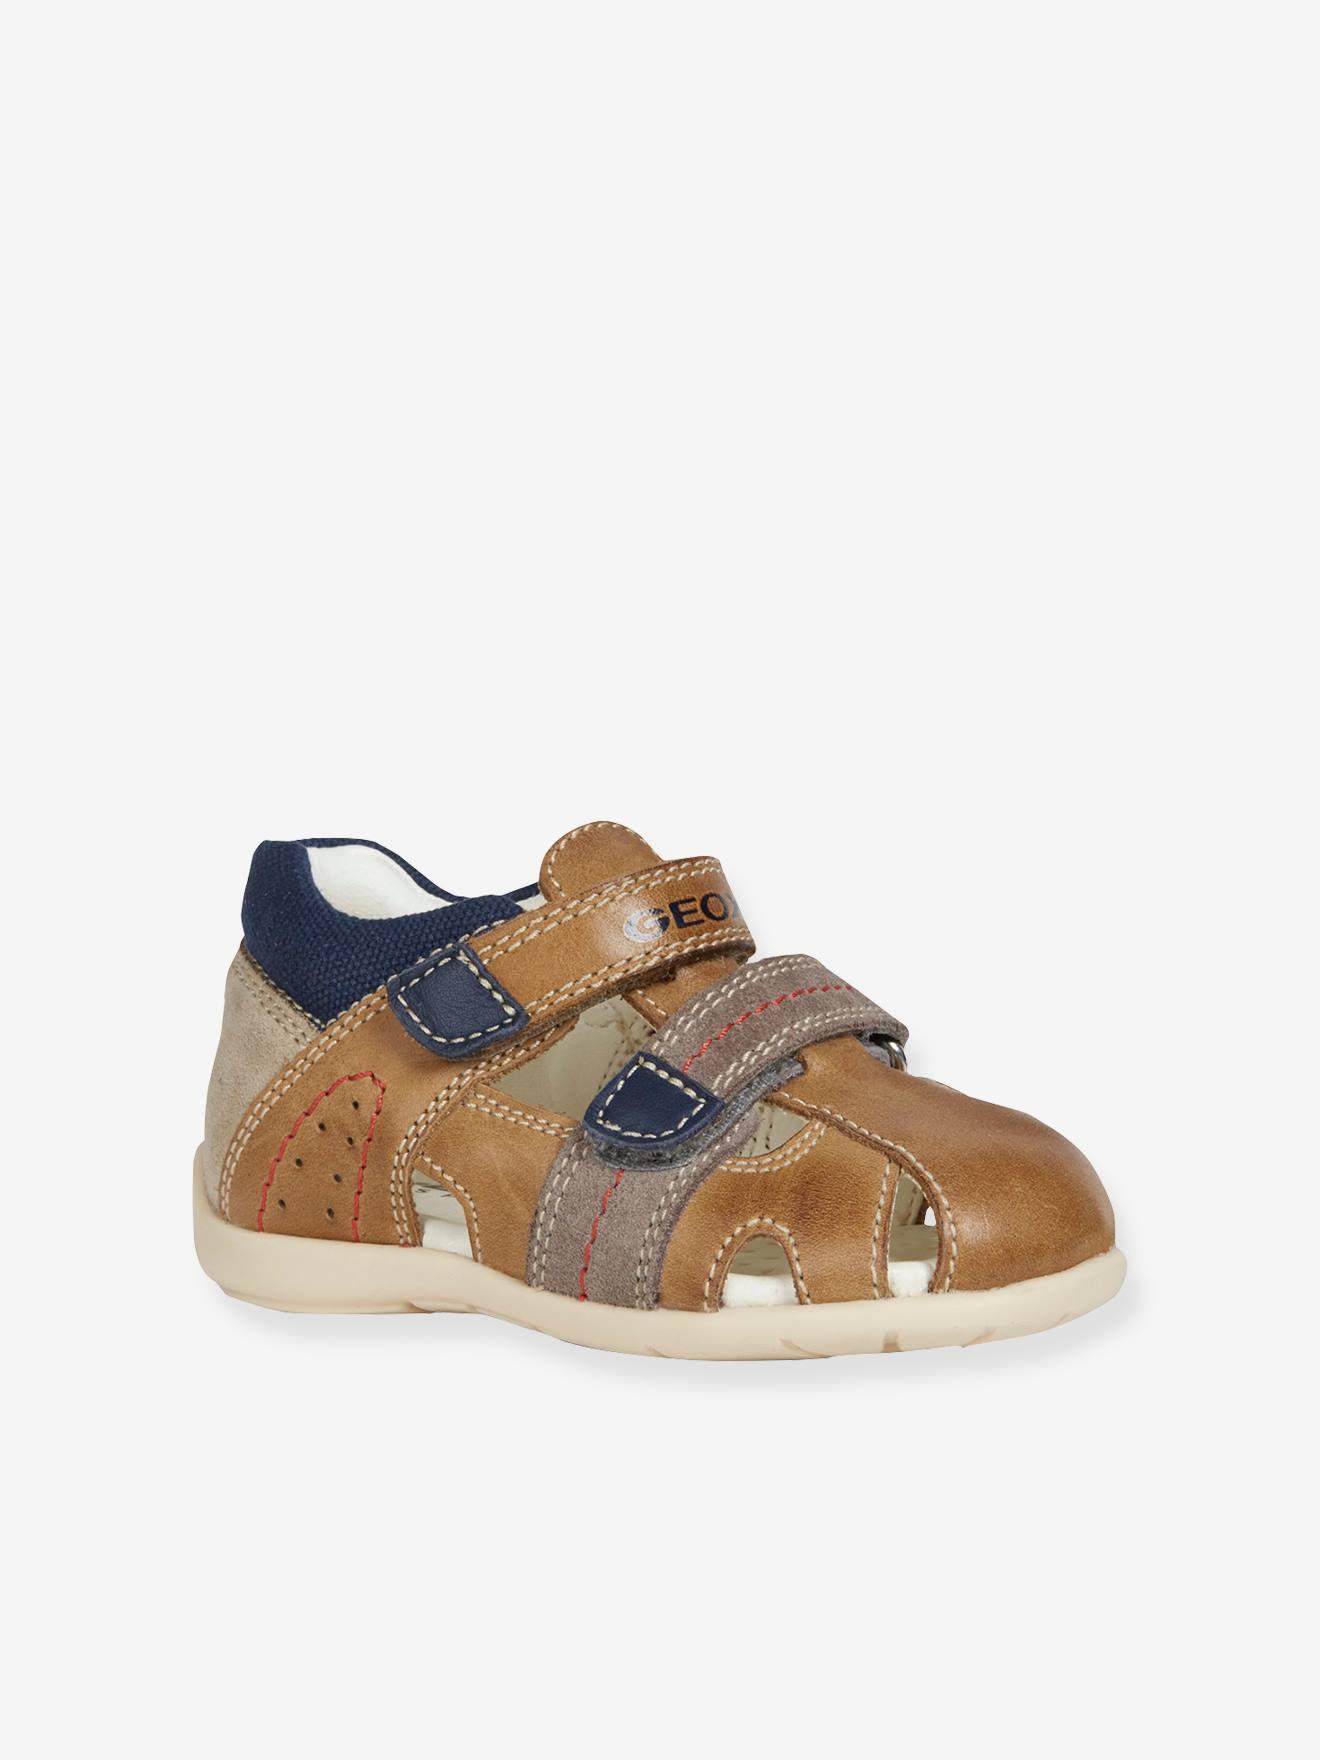 Sandales bébé garçon Kaytan Boy B GEOX® caramel, Chaussures